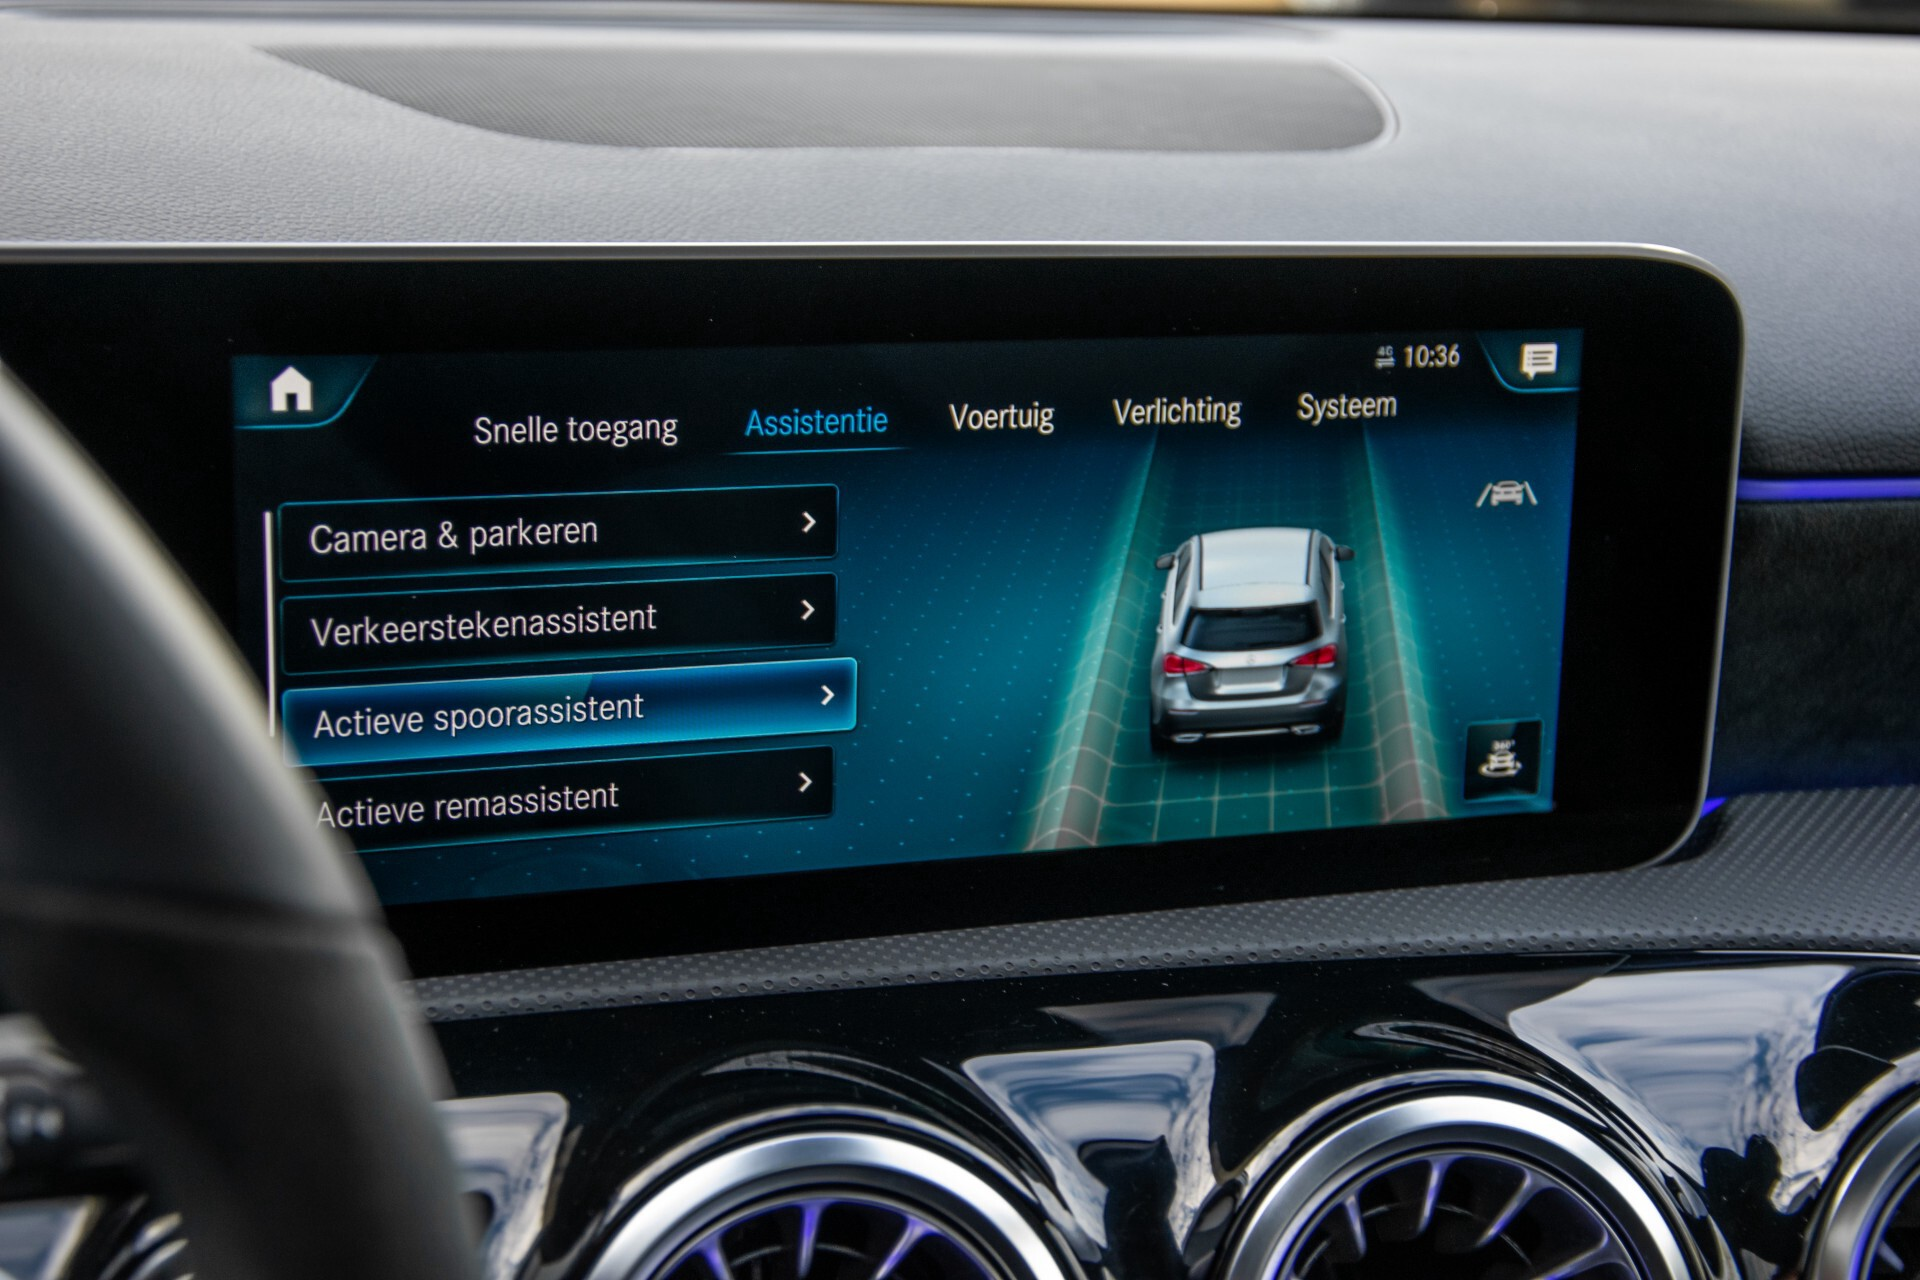 Mercedes-Benz A-Klasse 250 4-M AMG Panorama/Keyless-Entry/MBUX/HUD/Burmester/360/Multibeam LED Aut7 Foto 30